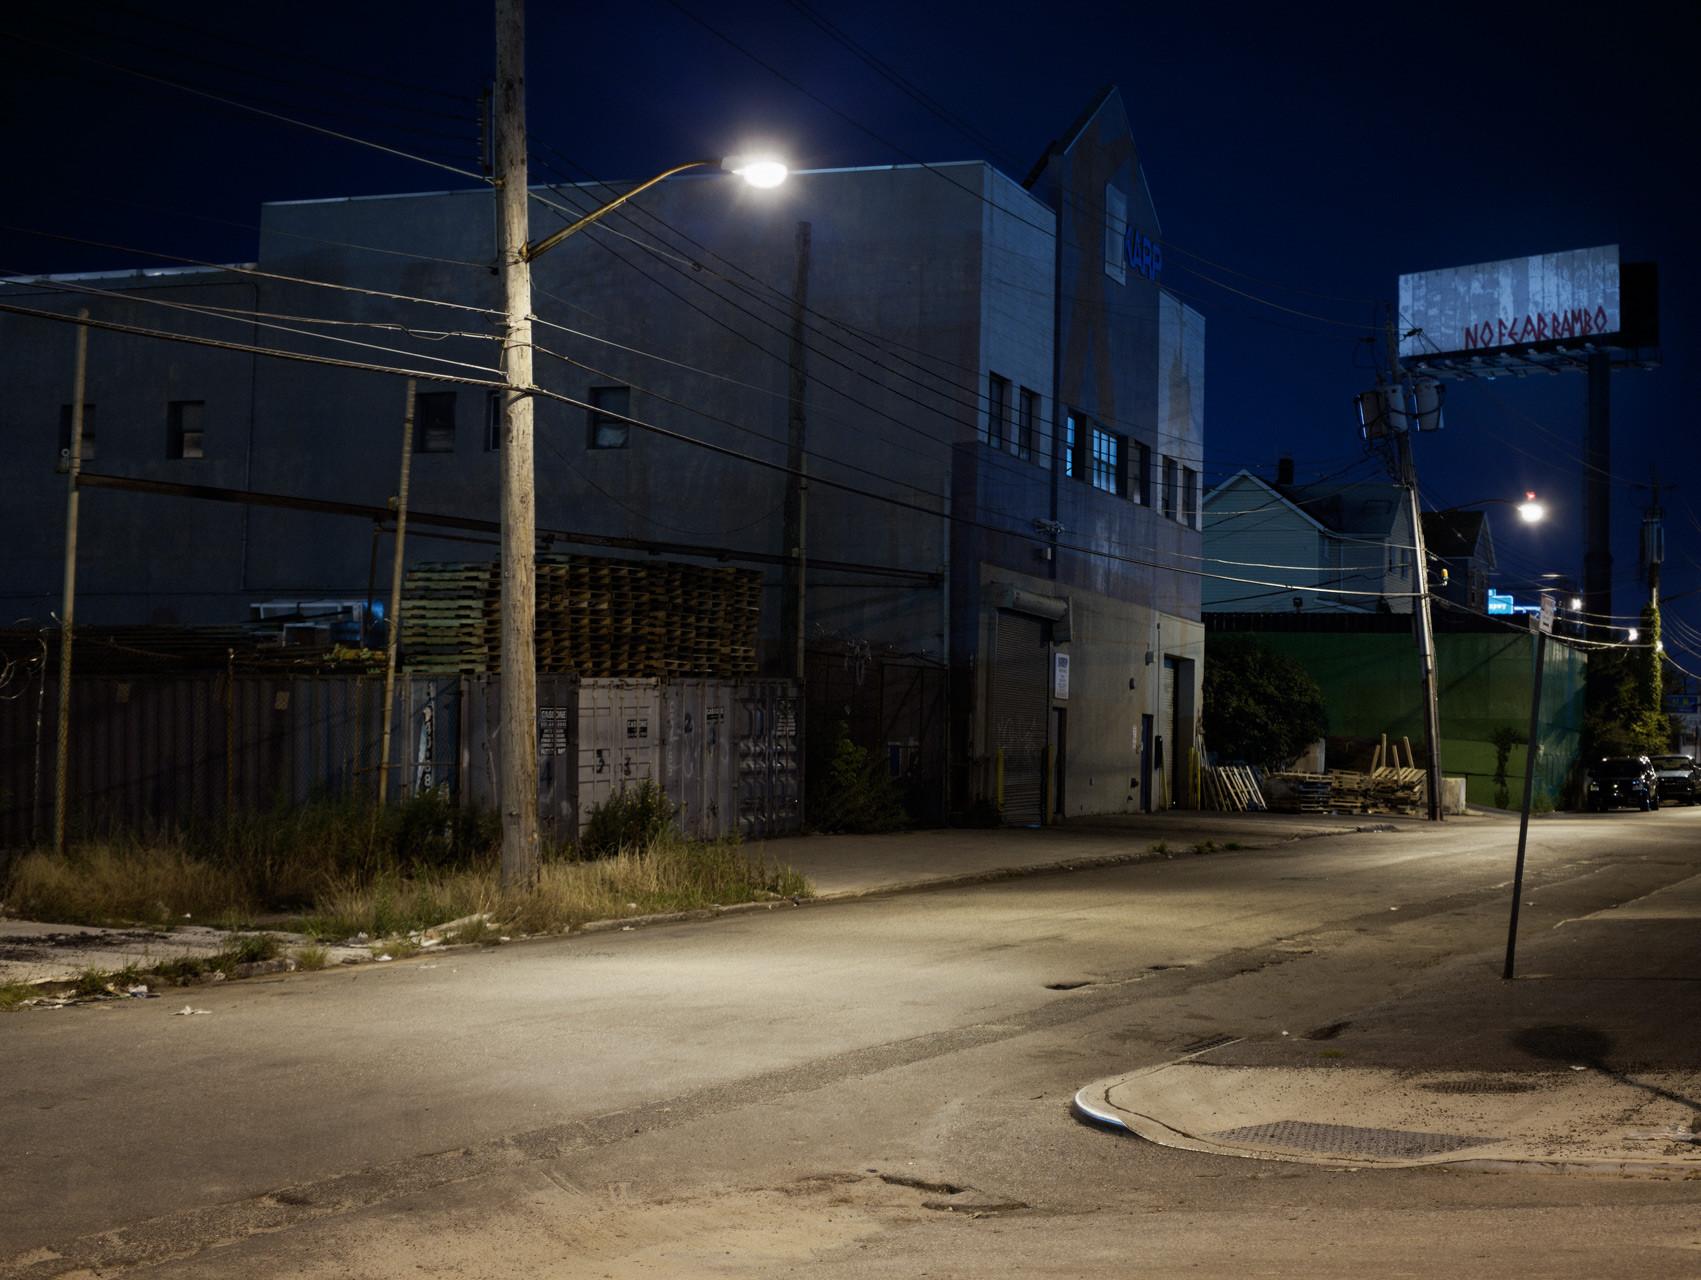 Timo_Stammberger_New_York_Queens_Maspeth_Night_Streetlights_Shady_Billboard